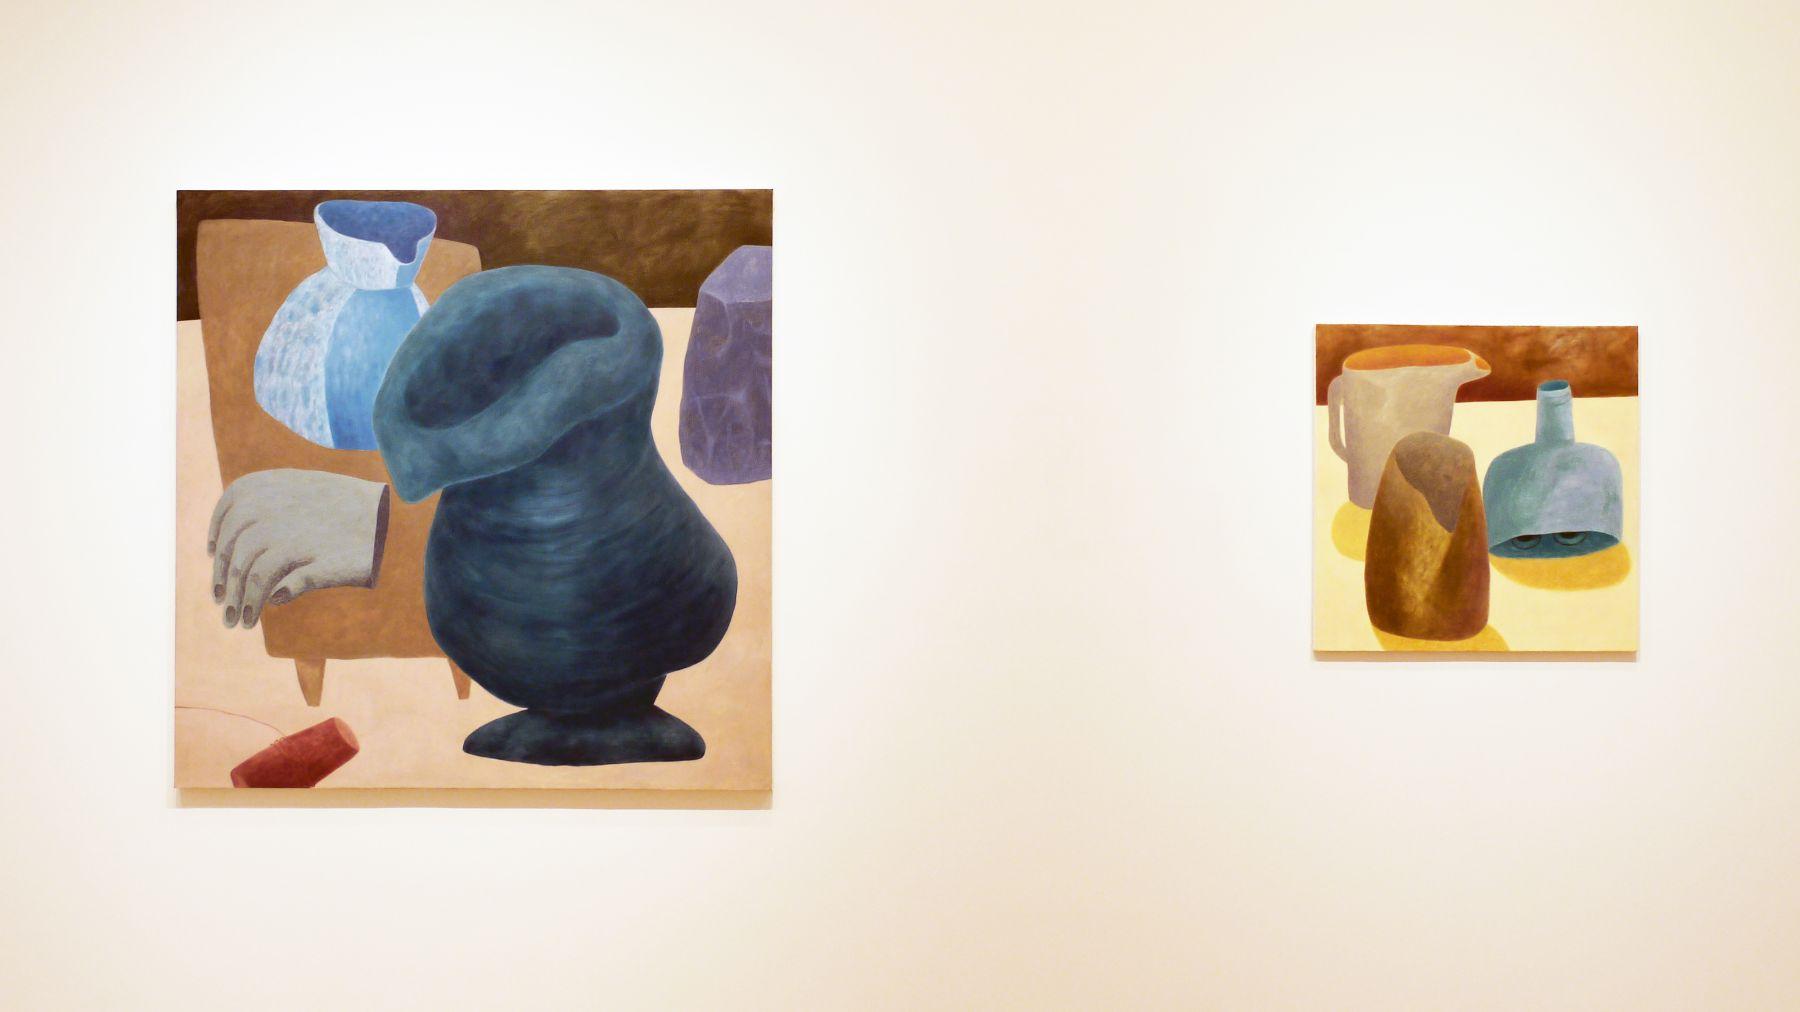 Me, My, Mine: Commanding Subjectivity in Painting